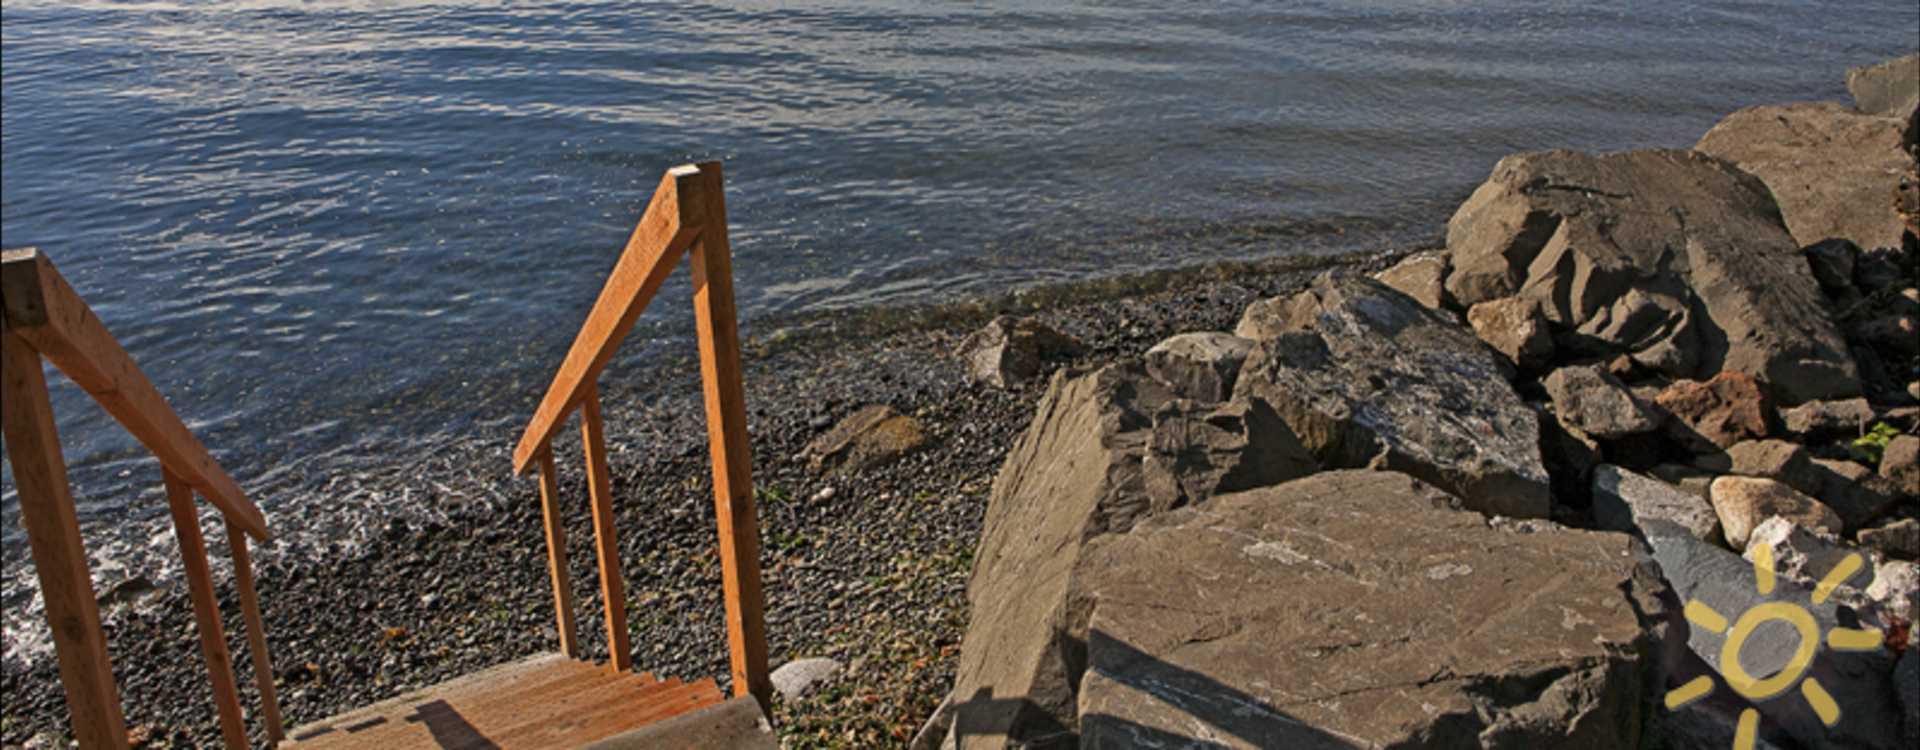 Puget_Sound_Villa_-_Vacation_Rental_Home.jpg